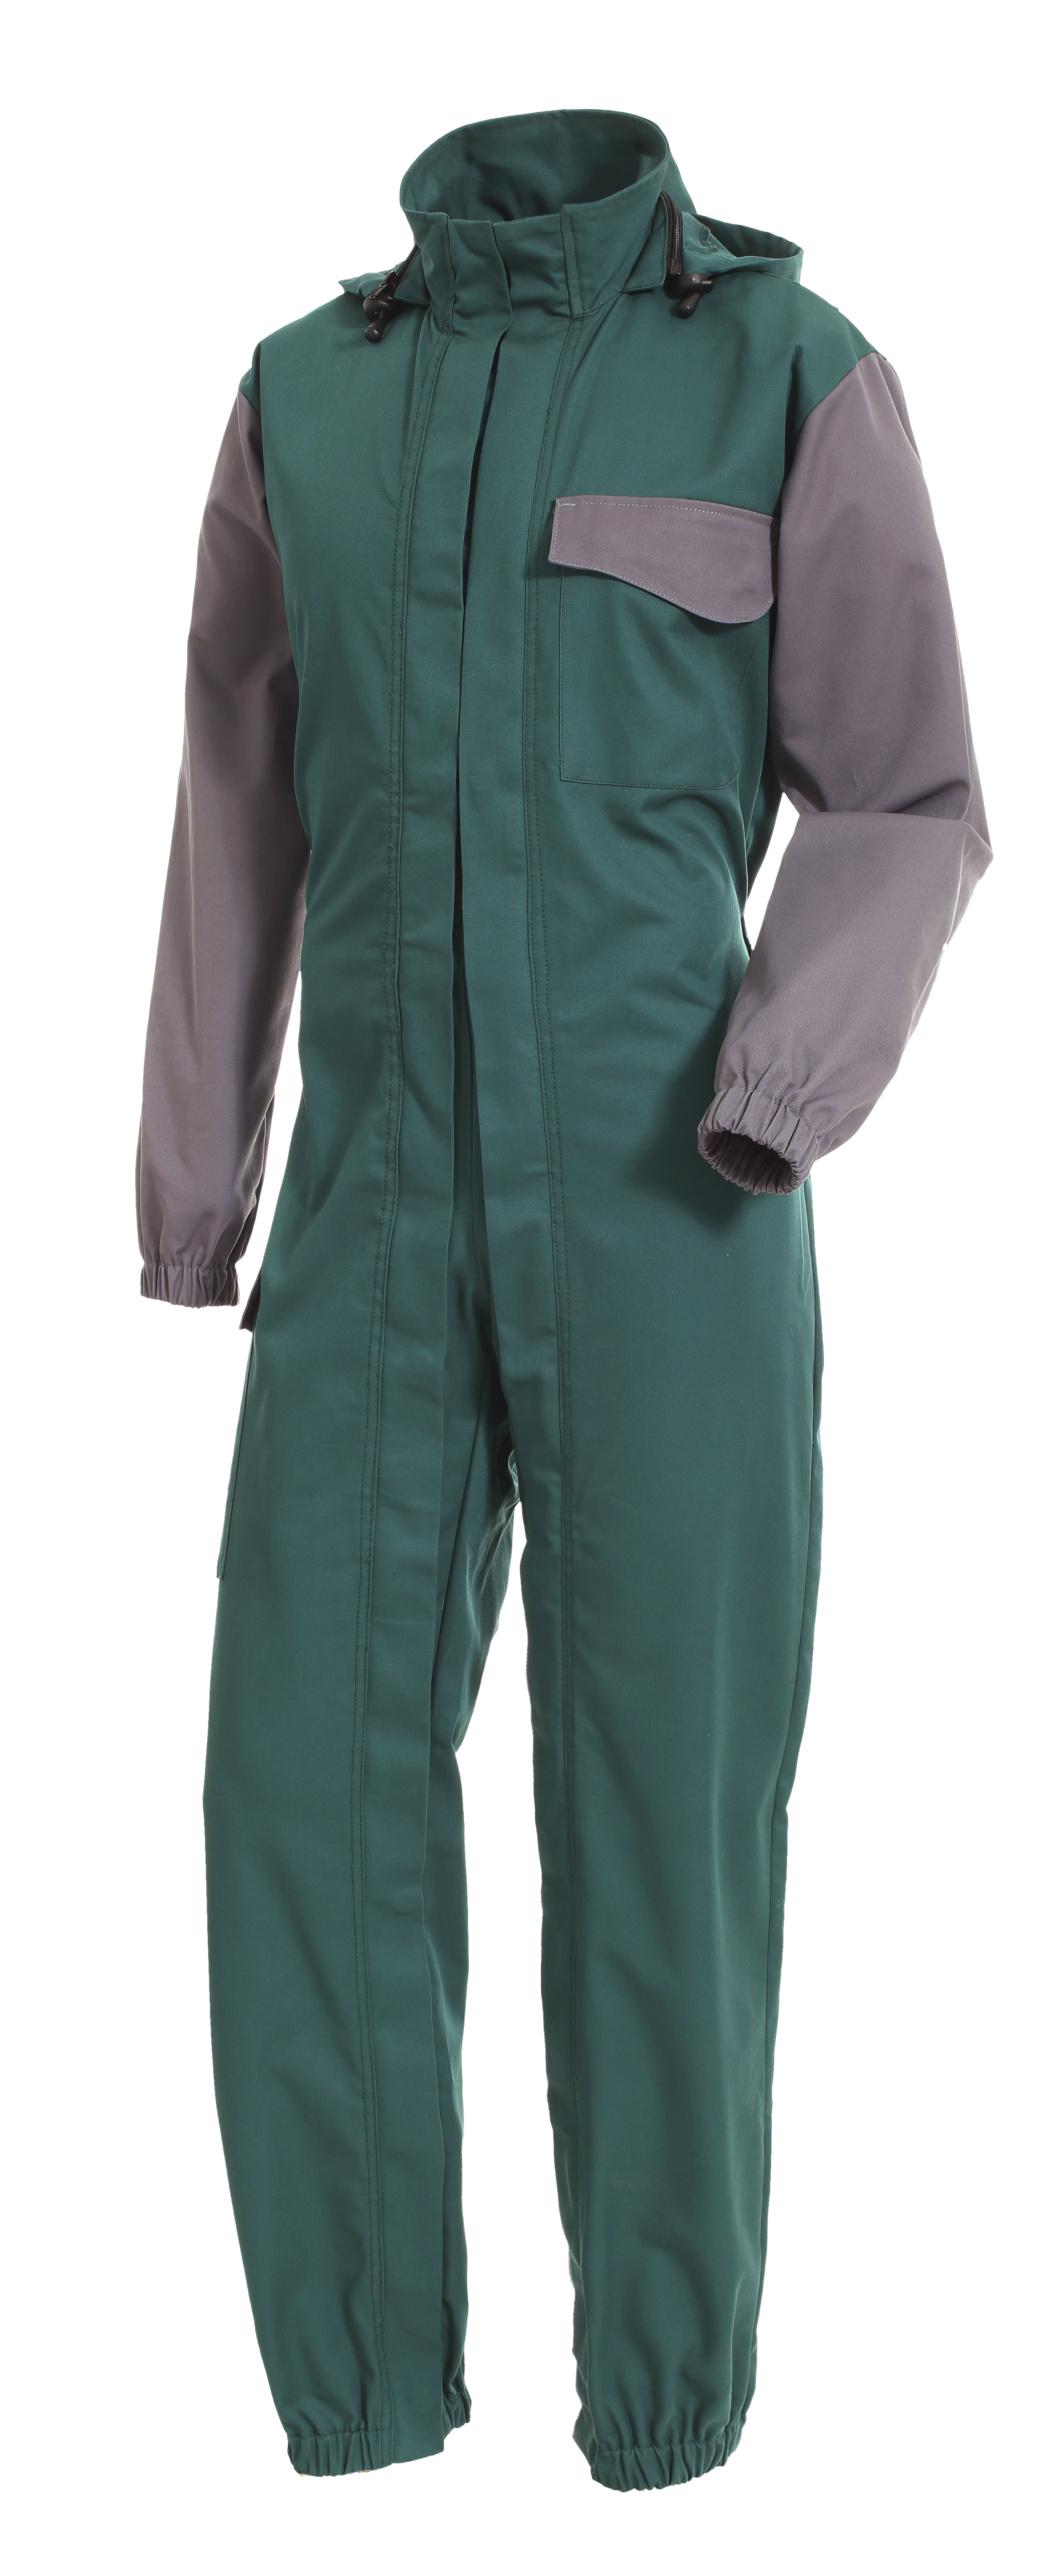 Pflanzenschutz-Overall Aegis ISO27065 C2, Gr. XXL (56/58)